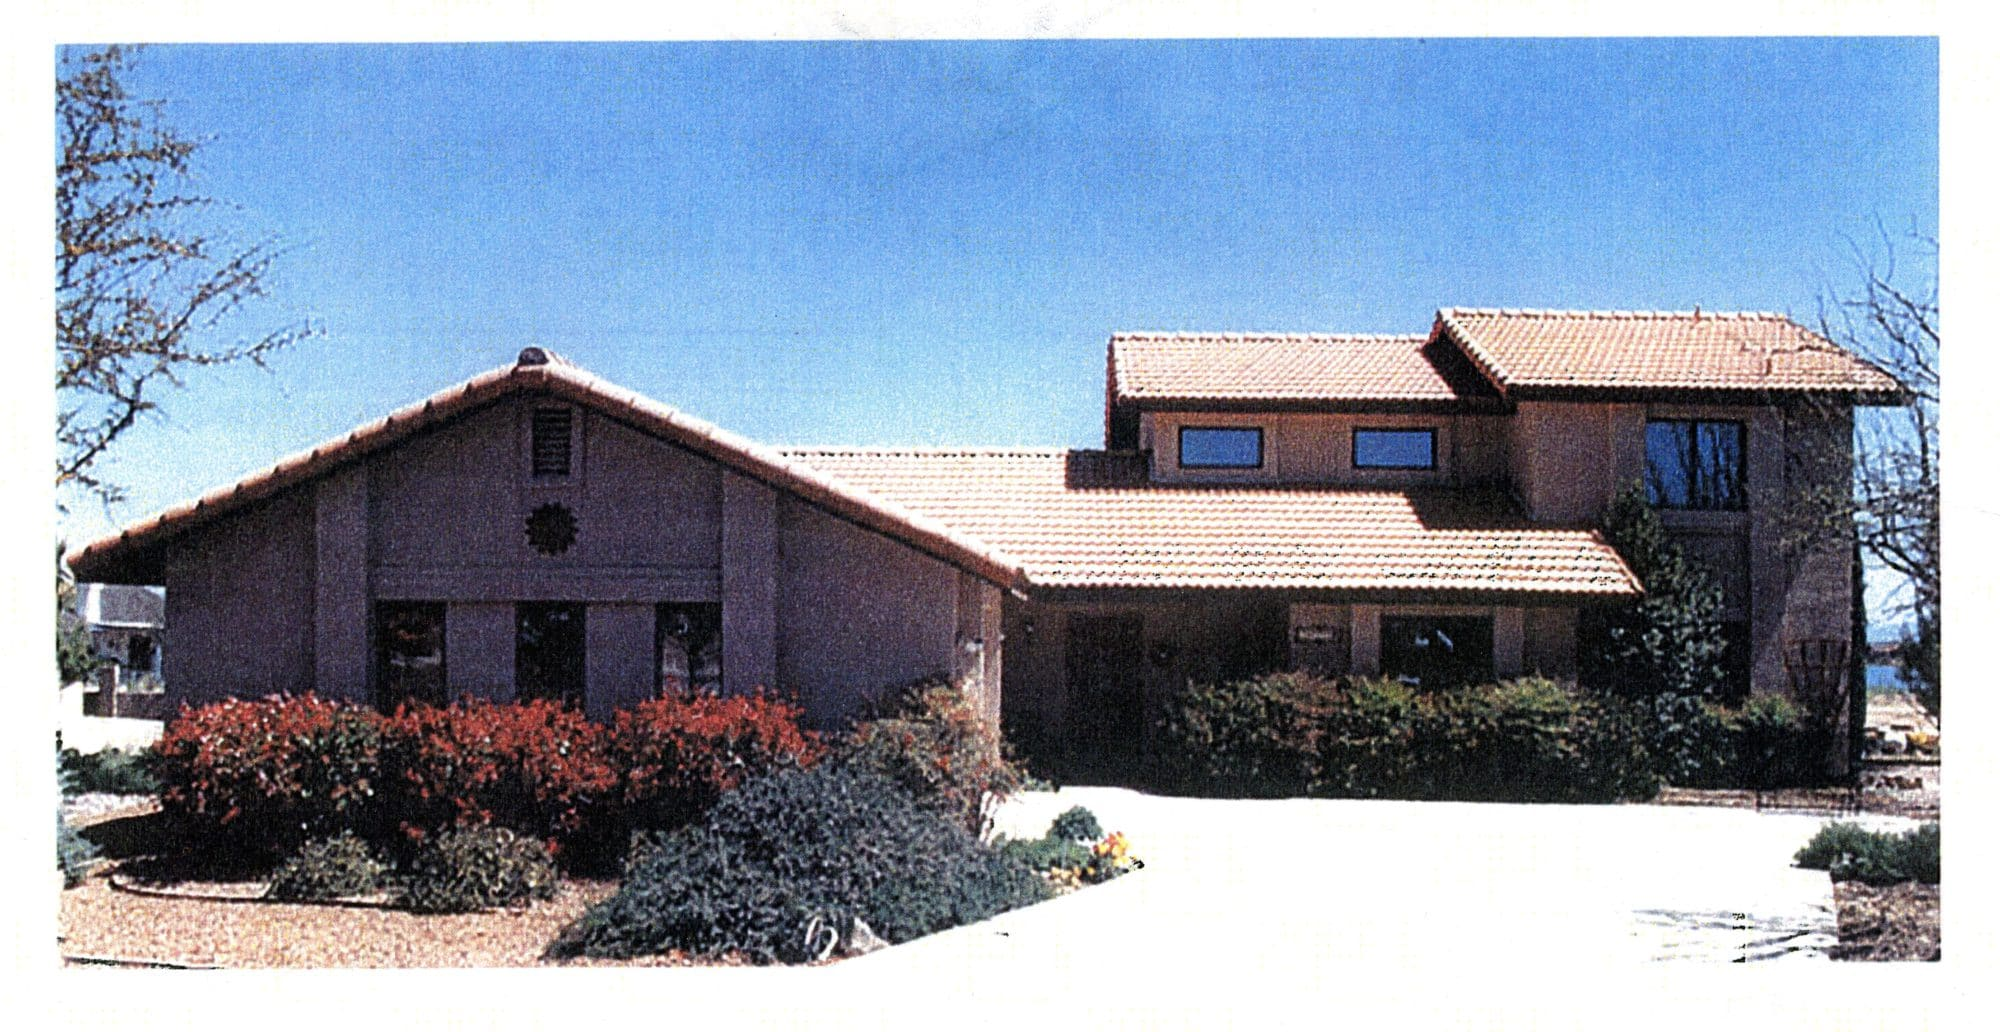 Sierra Remodeling Custom Home Model 2024 front view